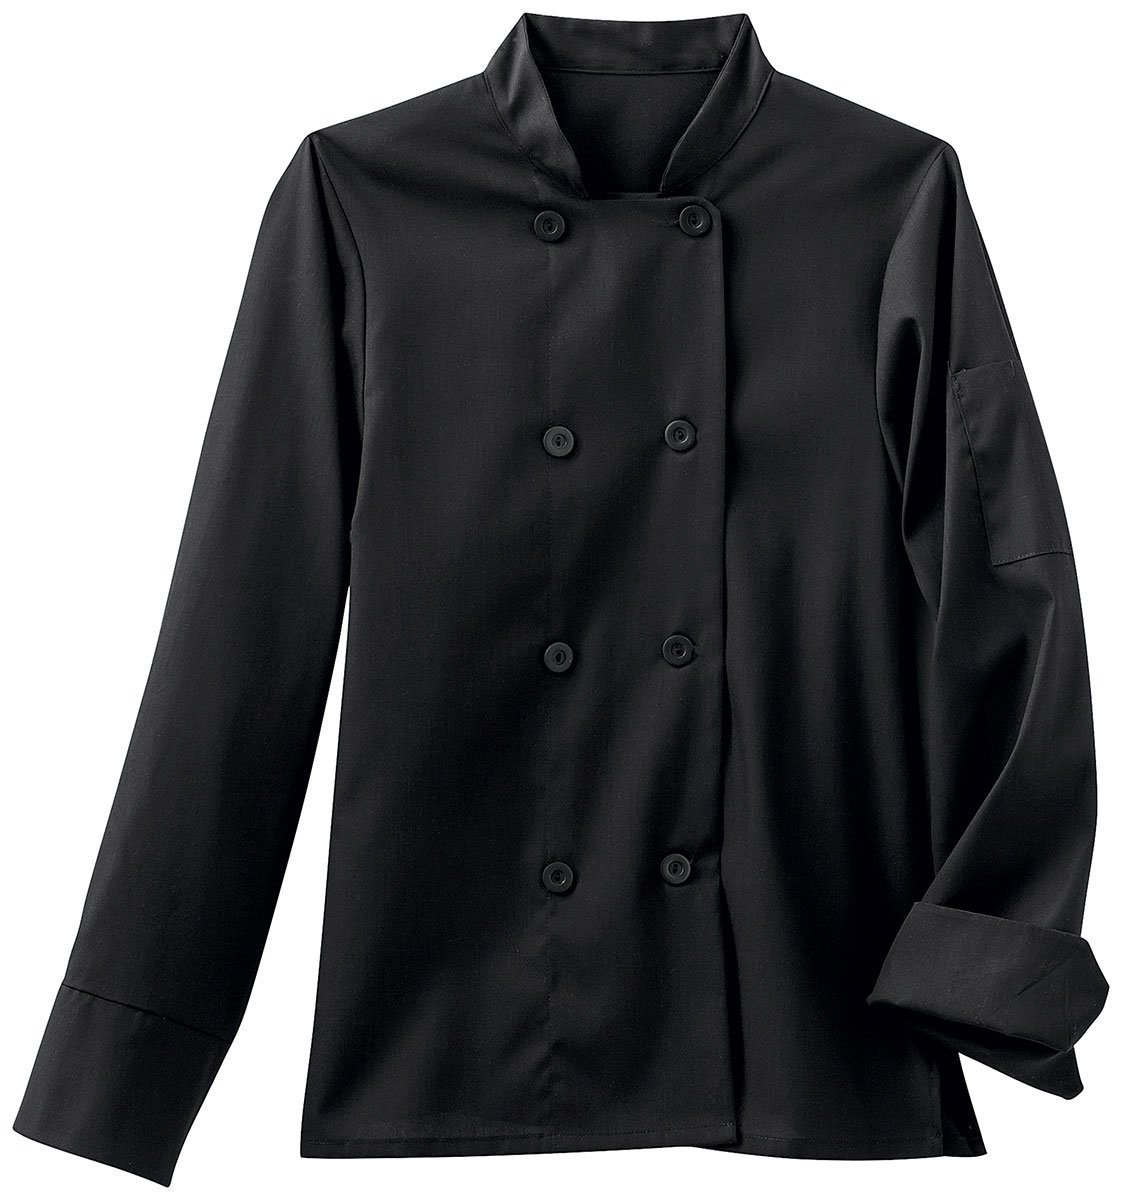 Five Star Chef Apparel Ladies 8 Button Jacket (Black, Small) by Five Star Chef Apparel